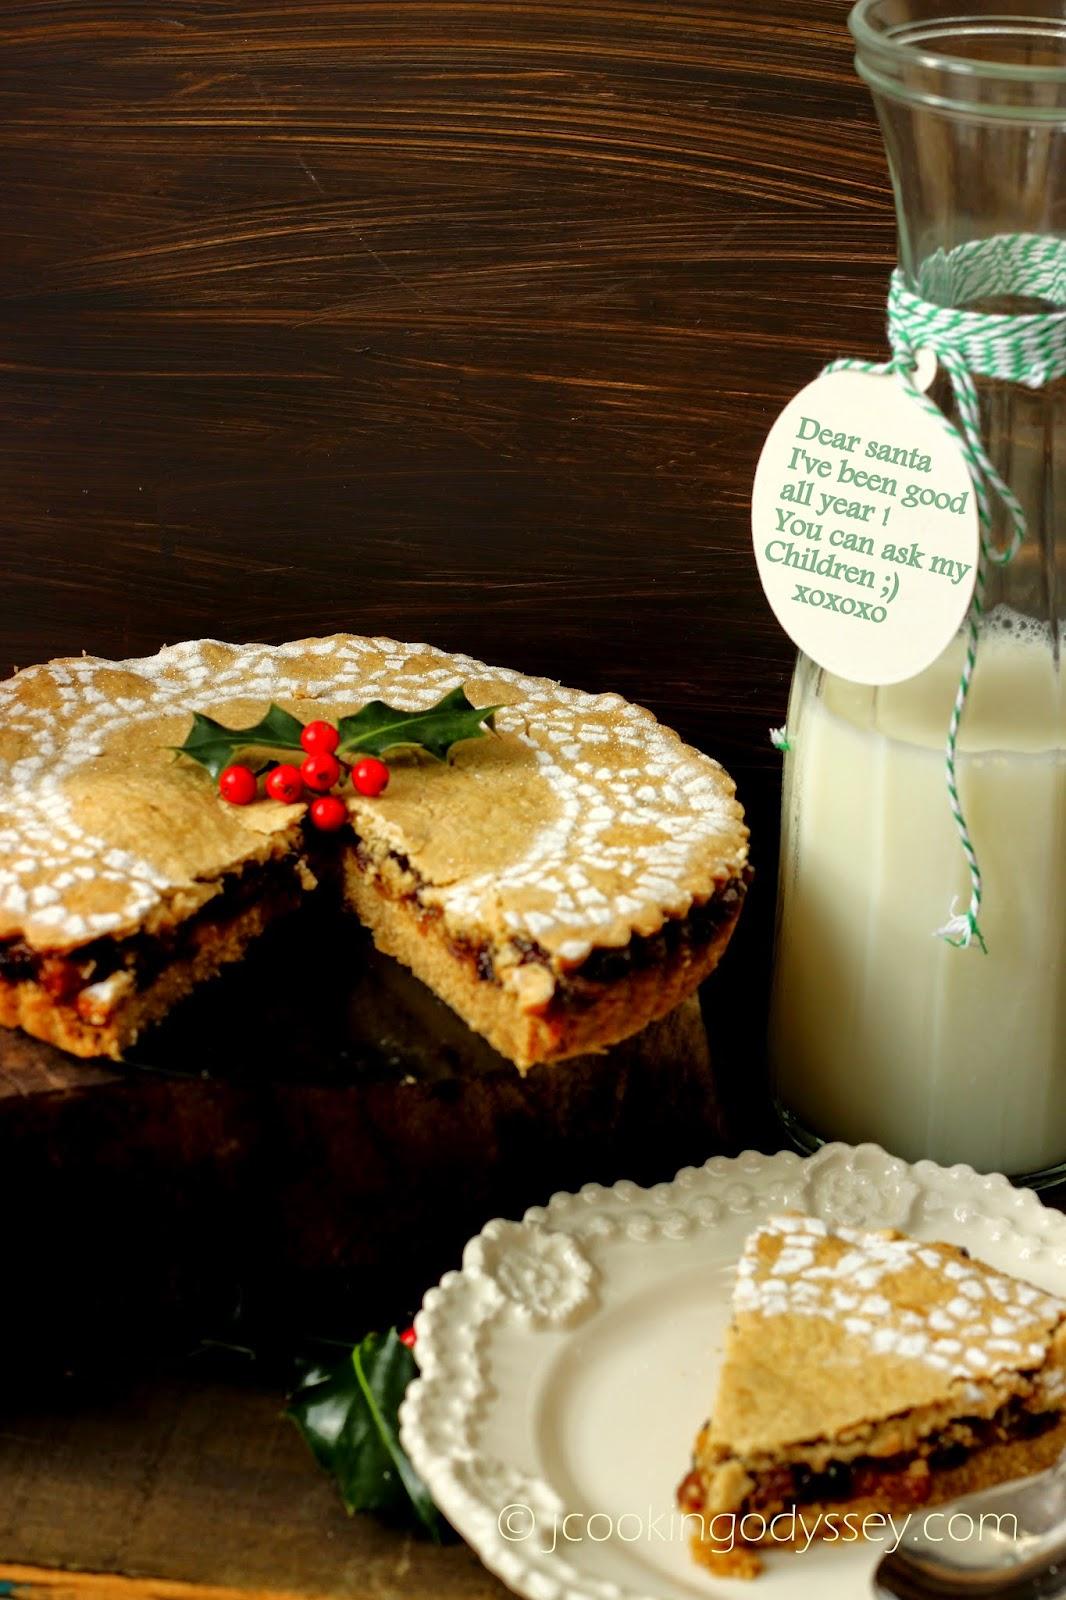 Jagruti's Cooking Odyssey: Matcha ( green tea ) Shortbread Cookies !